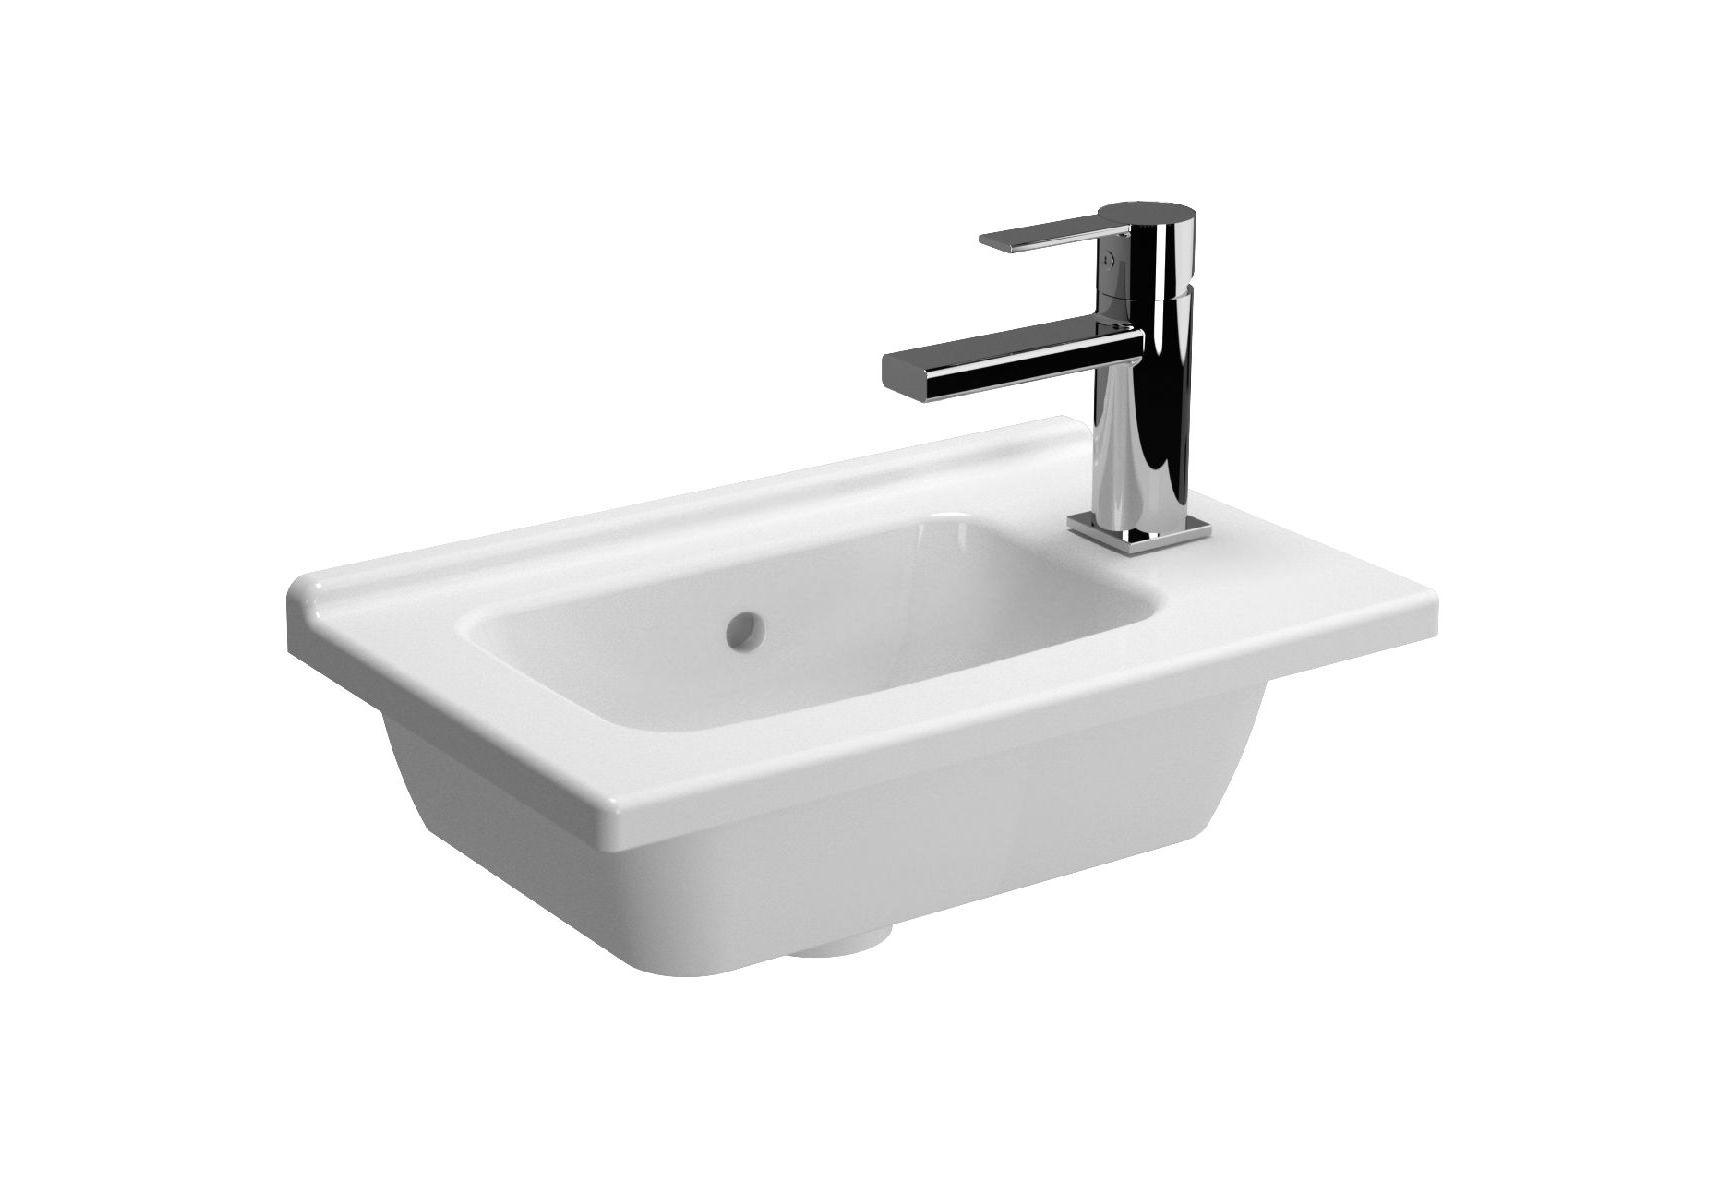 S50 Compact Right Vanity Basin, 45x28cm